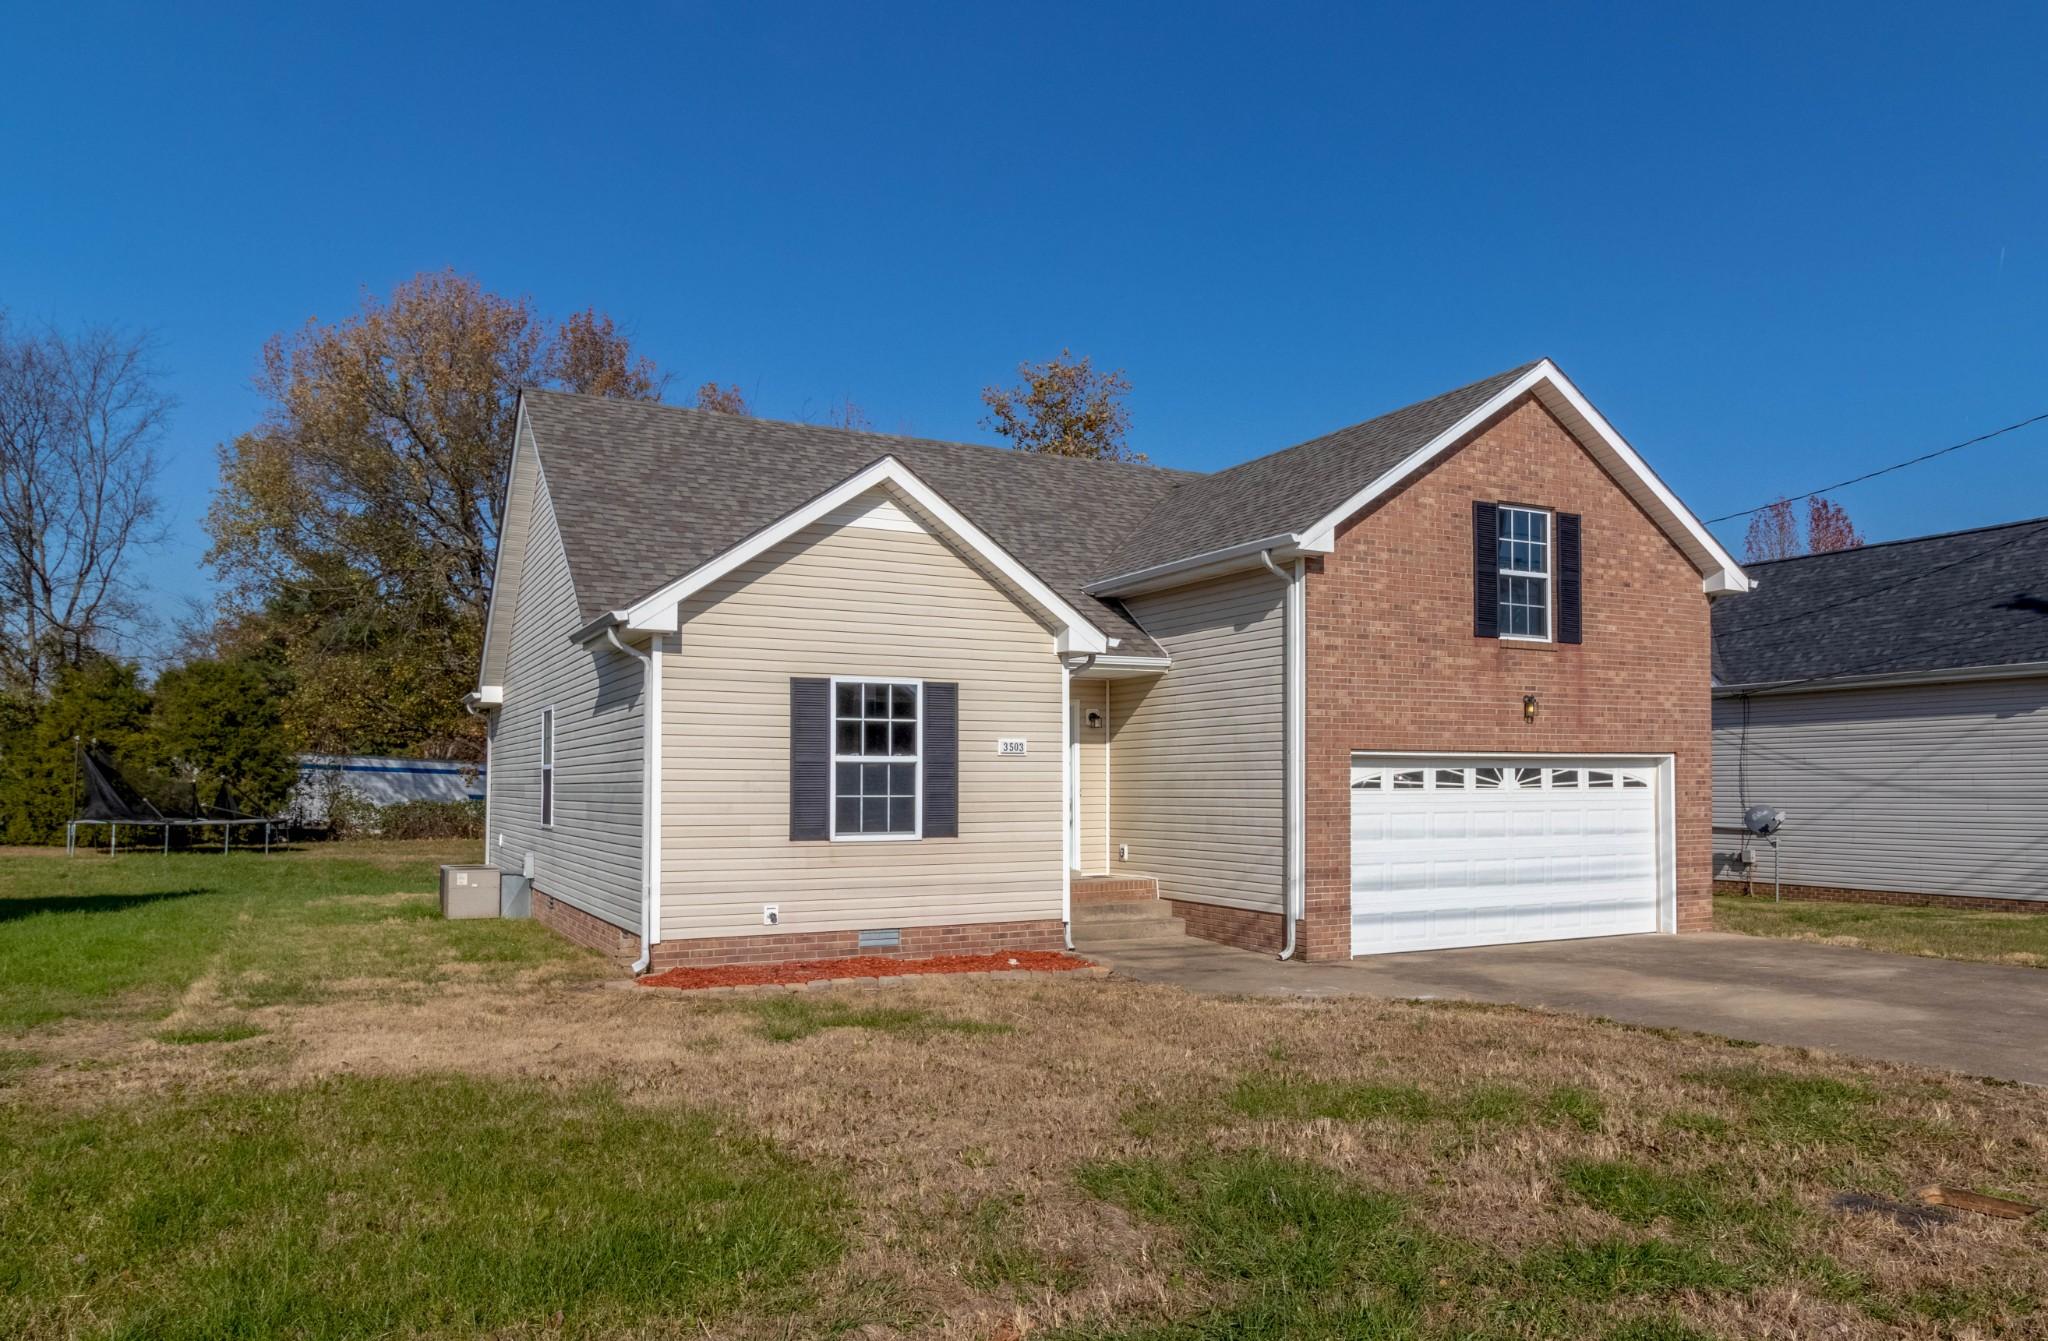 3503 Sandpiper Dr Property Photo - Clarksville, TN real estate listing